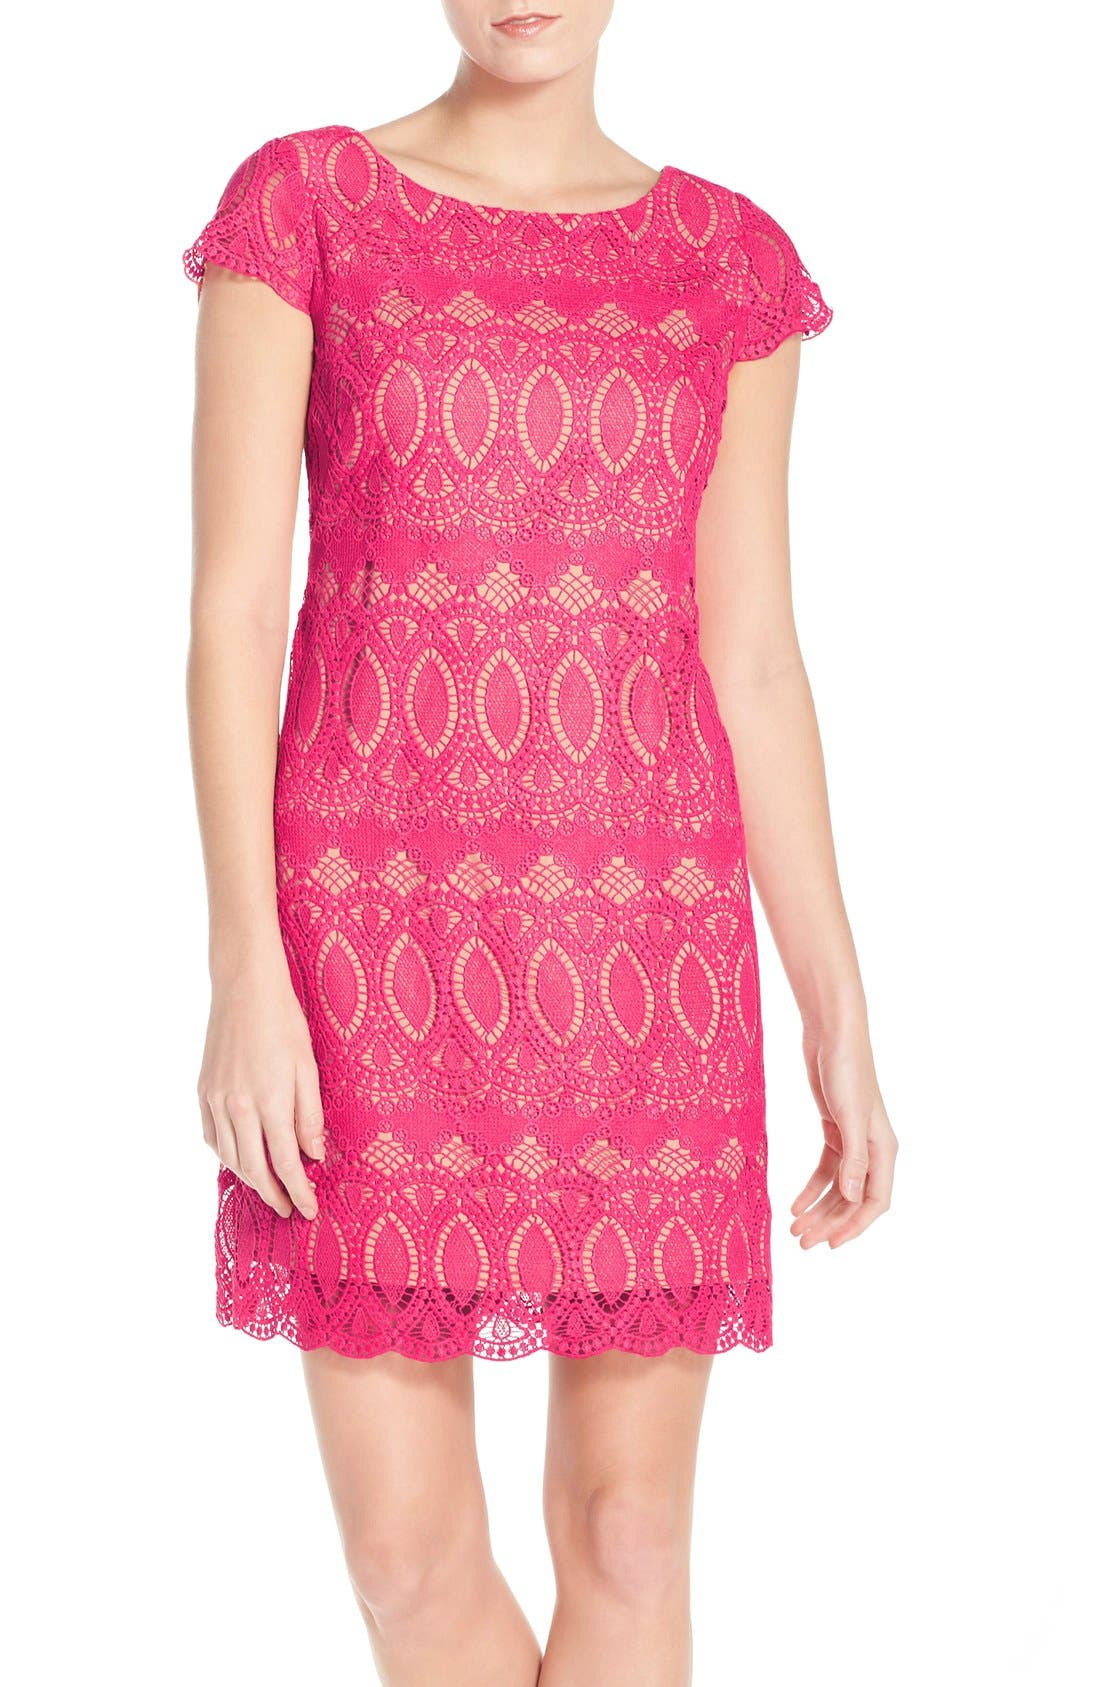 Scalloped Lace Sheath Dress,                             Main thumbnail 1, color,                             660